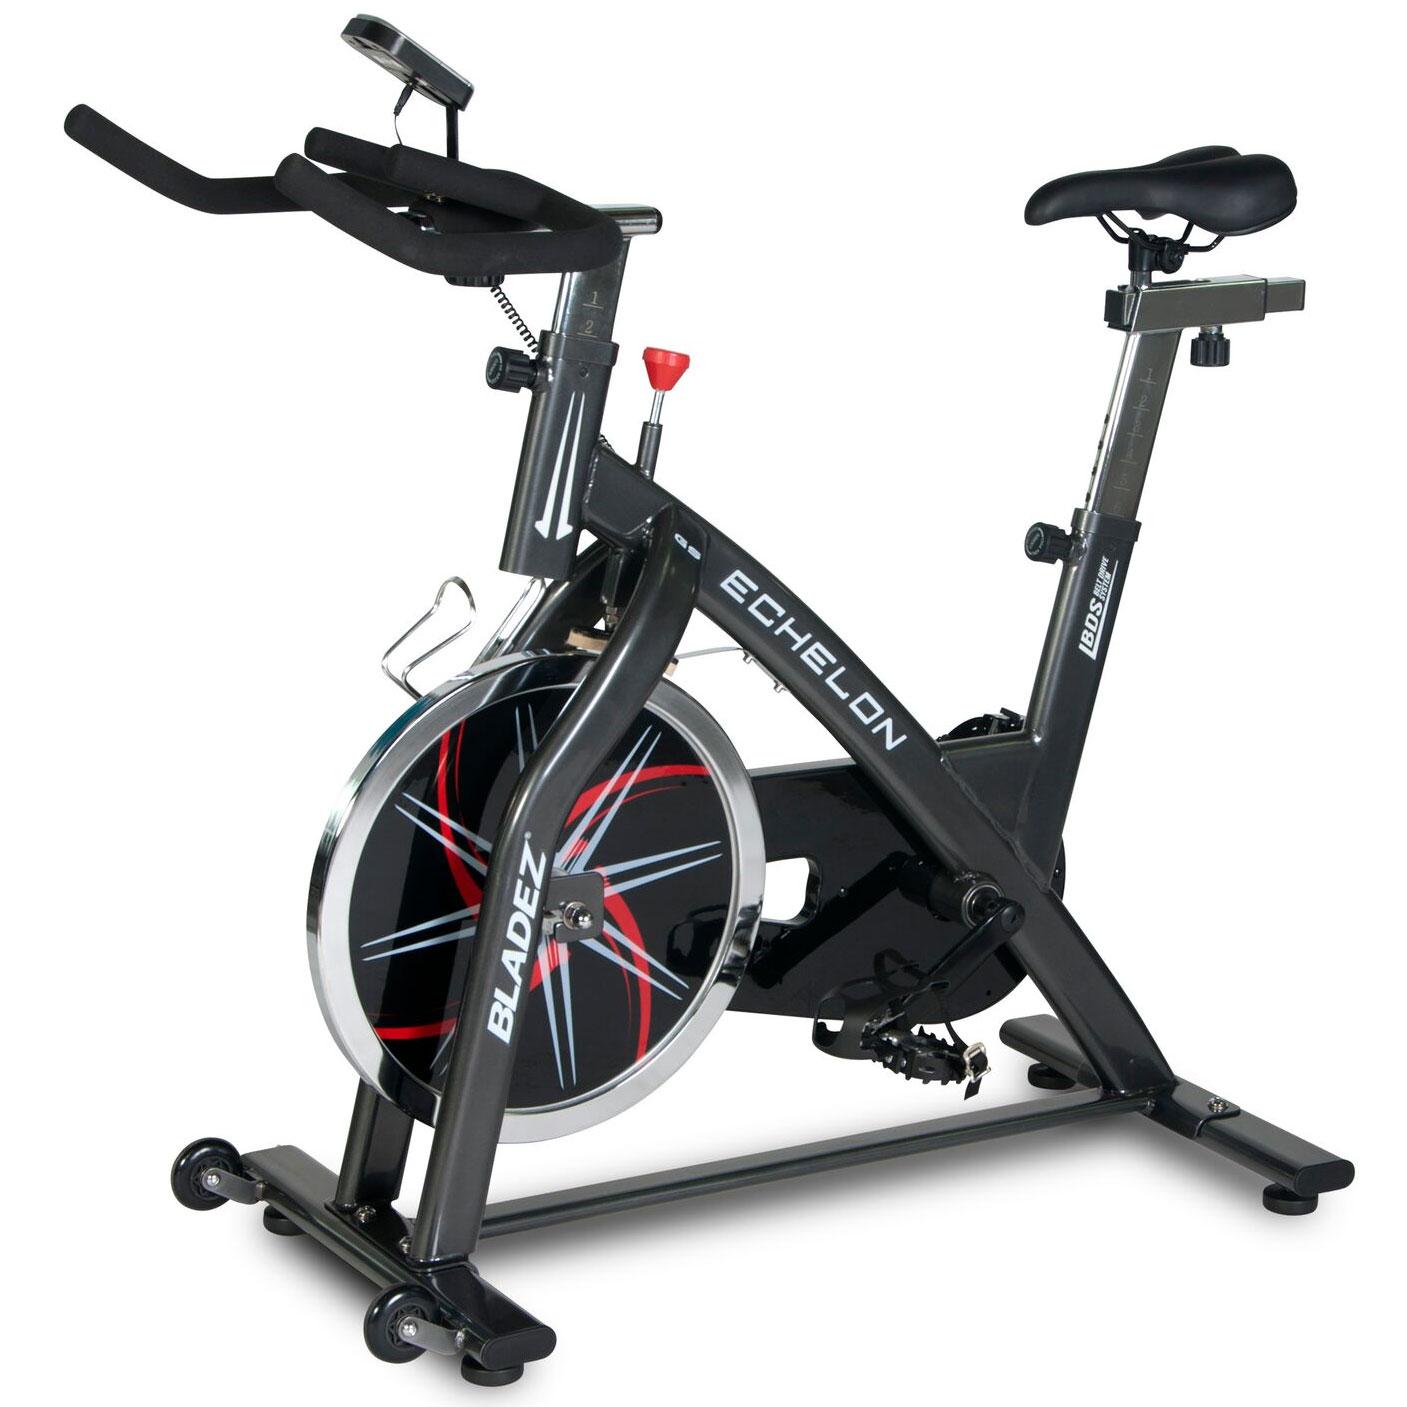 Echelon GS Bladez Fitness Stationary Indoor Cardio Exercise Fitness Cycling Bike 835126203109  eBay